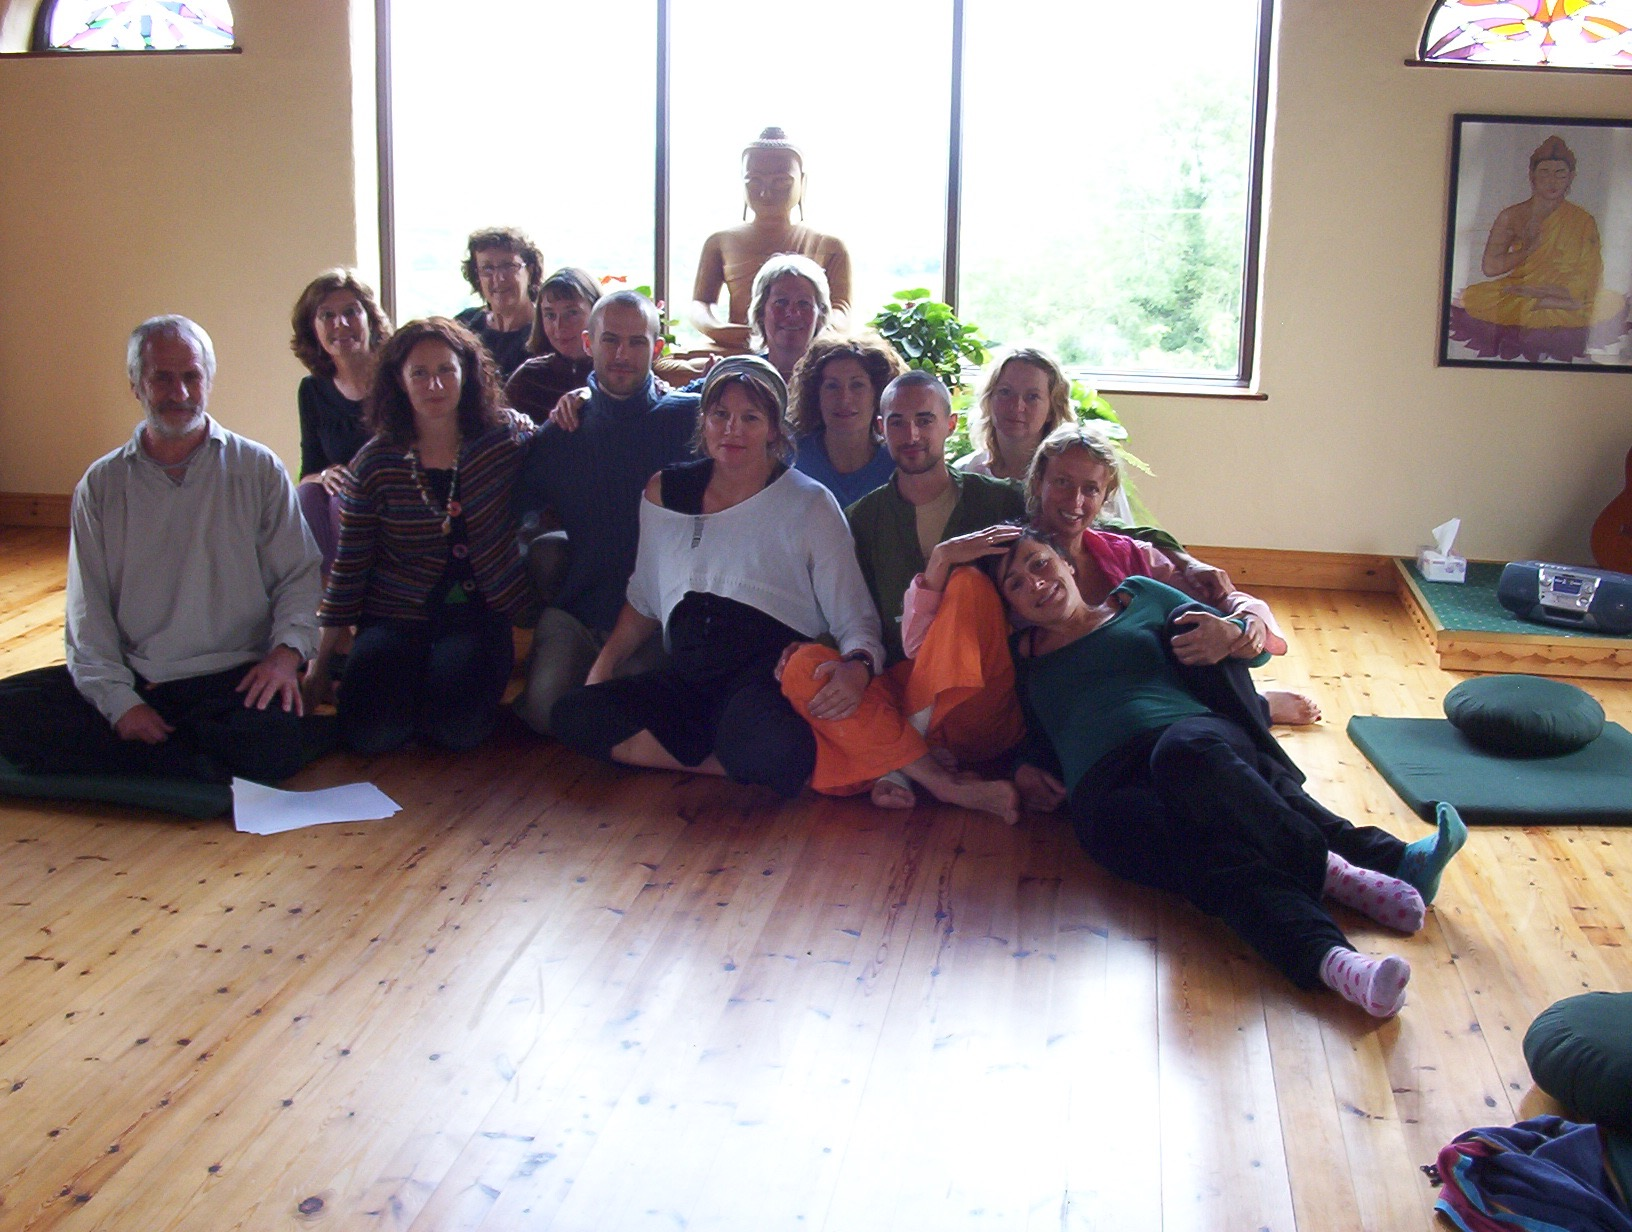 Training group at Sunyata Buddhist Retreat Centre